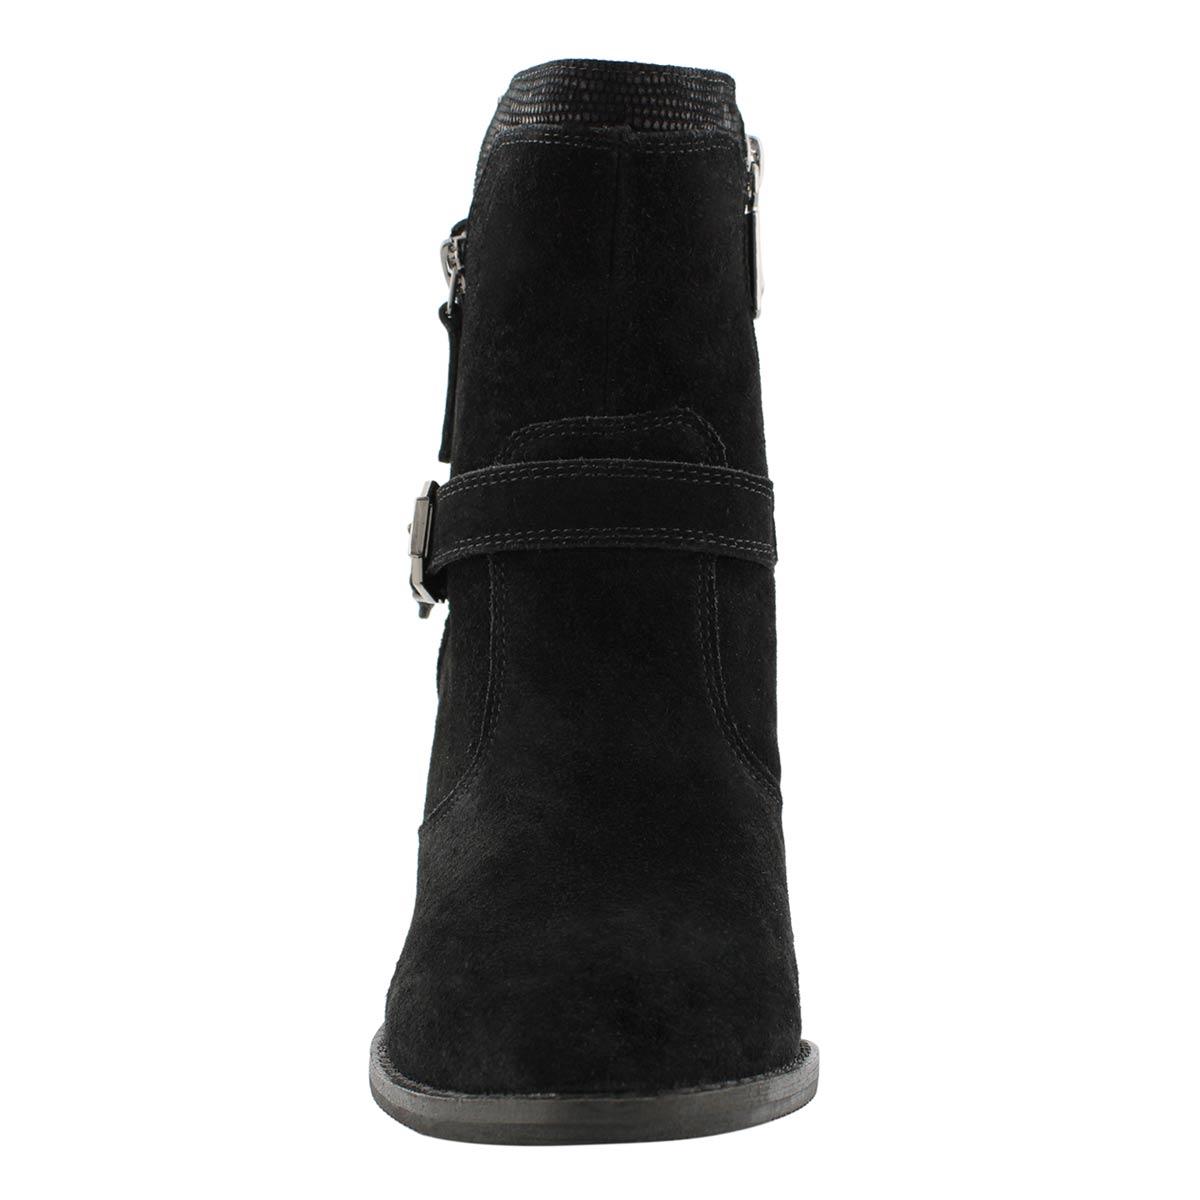 Lds Nova blk wtpf zip ankle boot